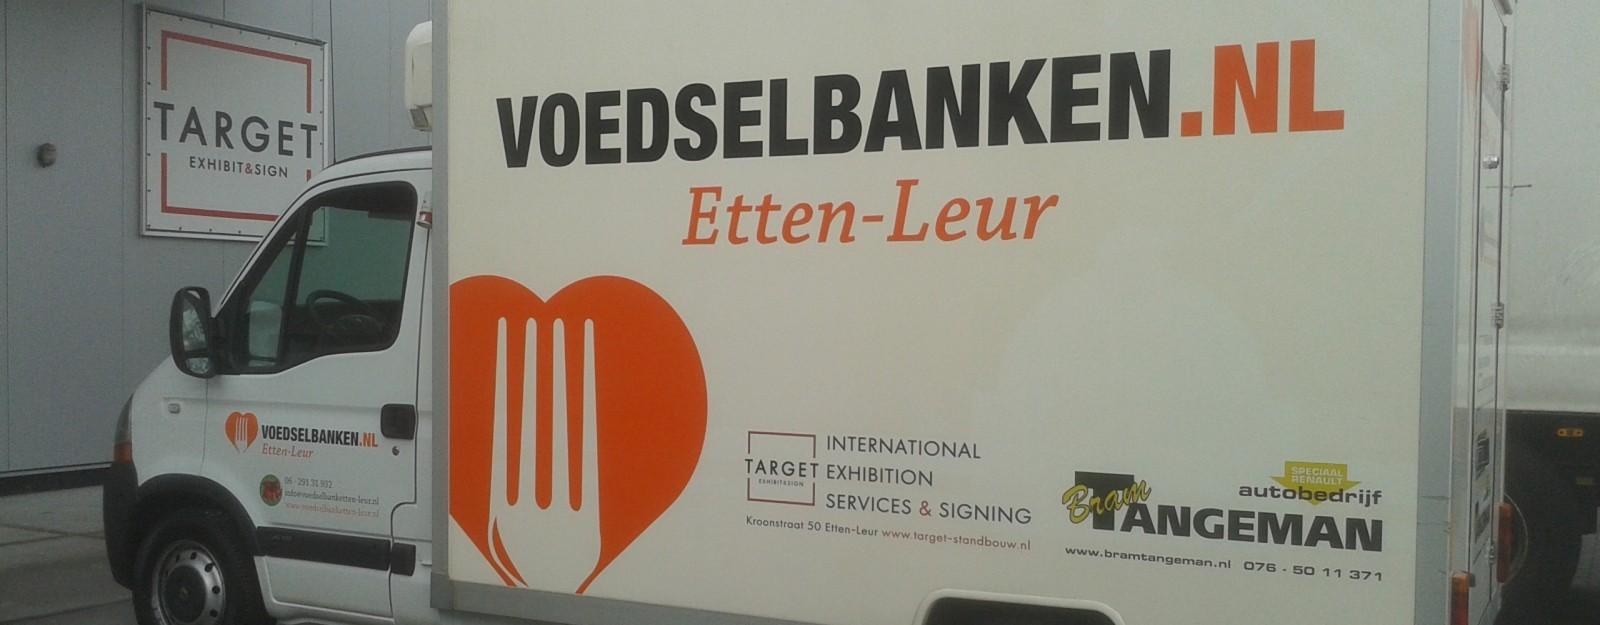 Thumbnail Donatie Voedselbank Etten-Leur